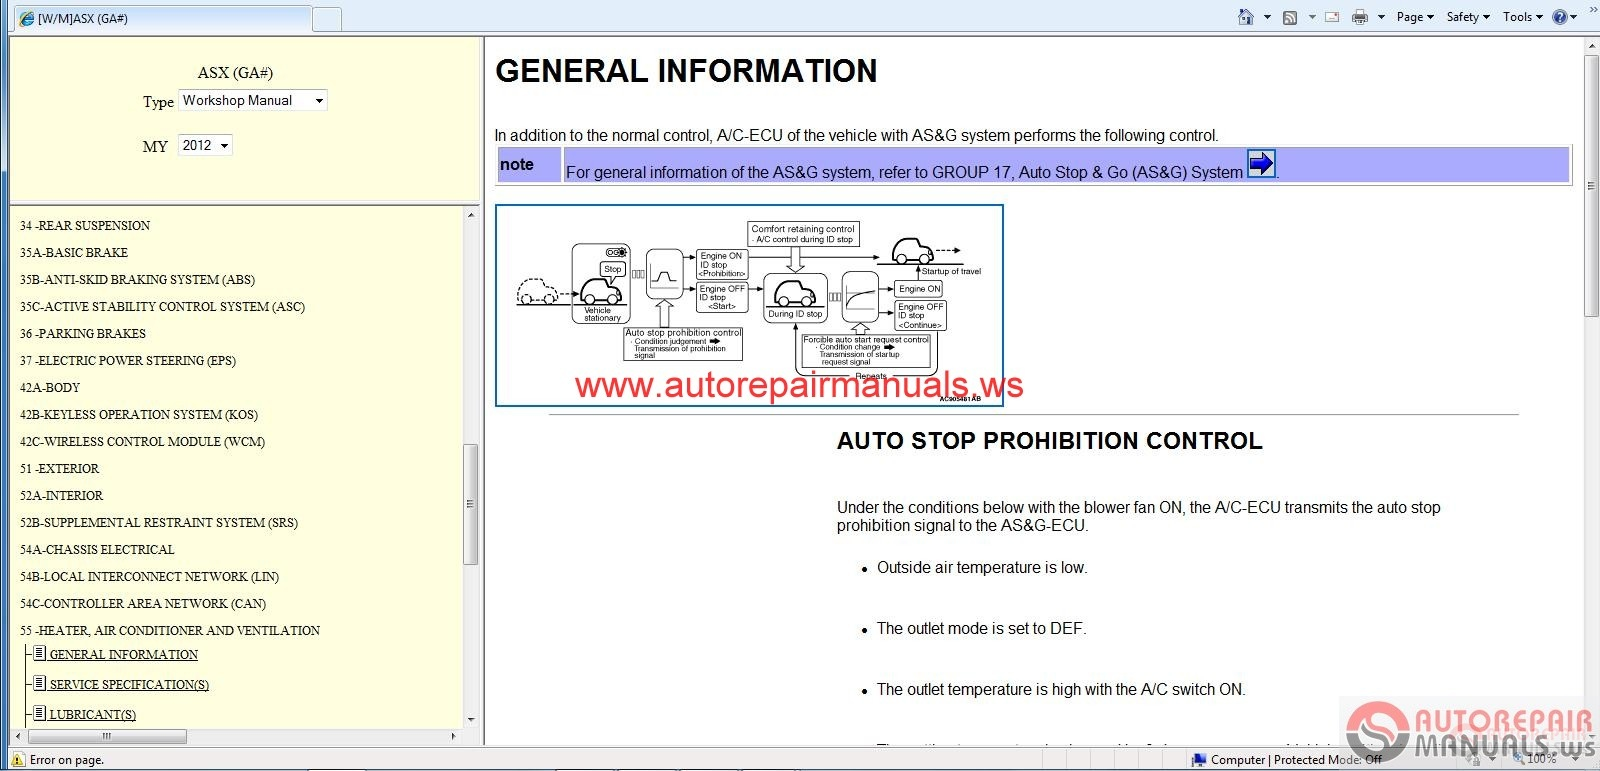 Mitsubishi Asx 2012 Workshop Manual